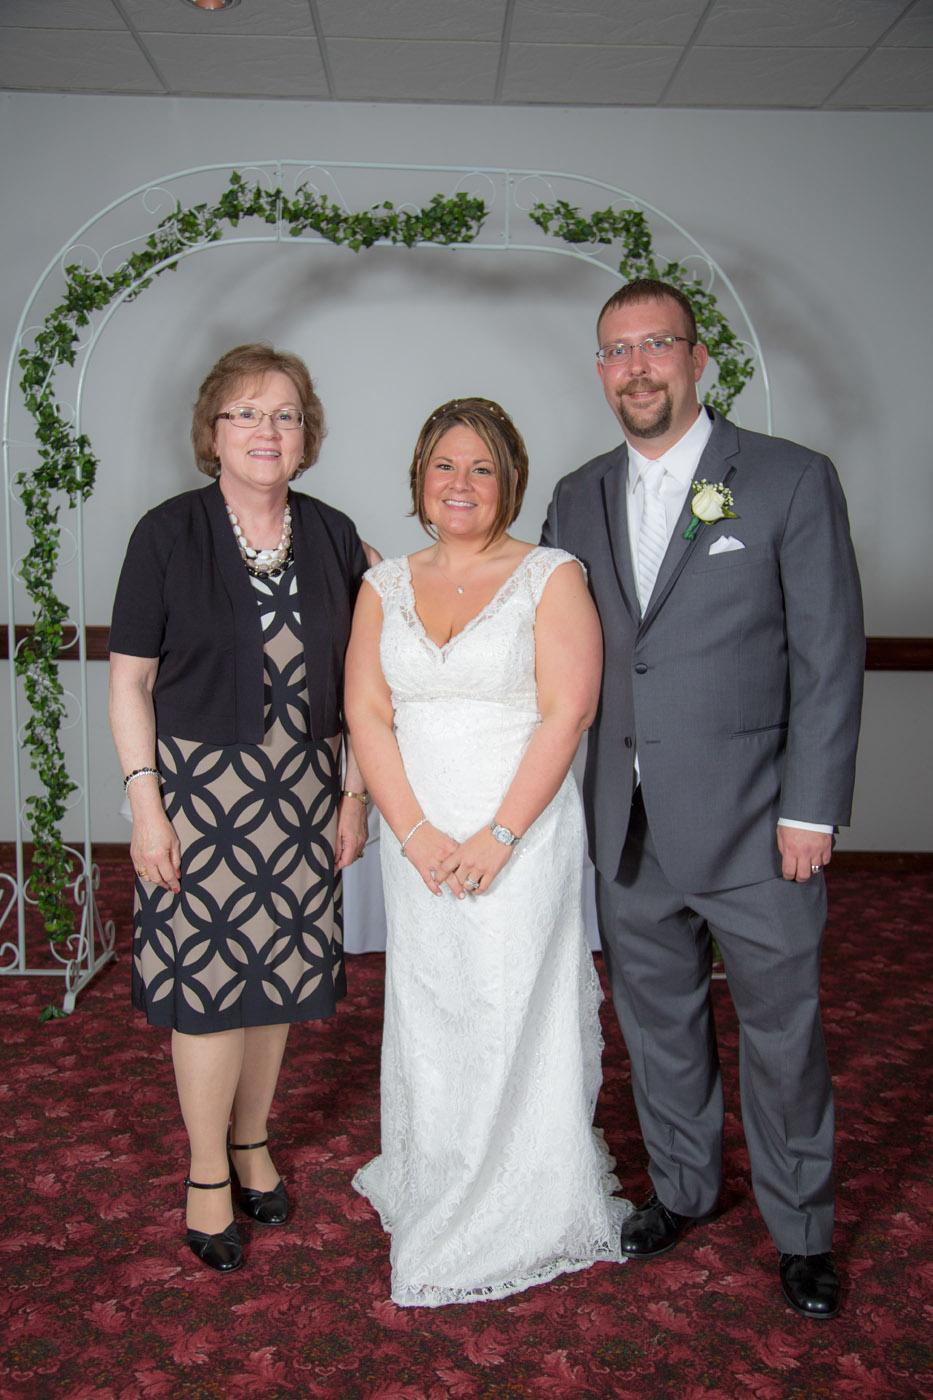 Healy Wedding 1 1428.jpg